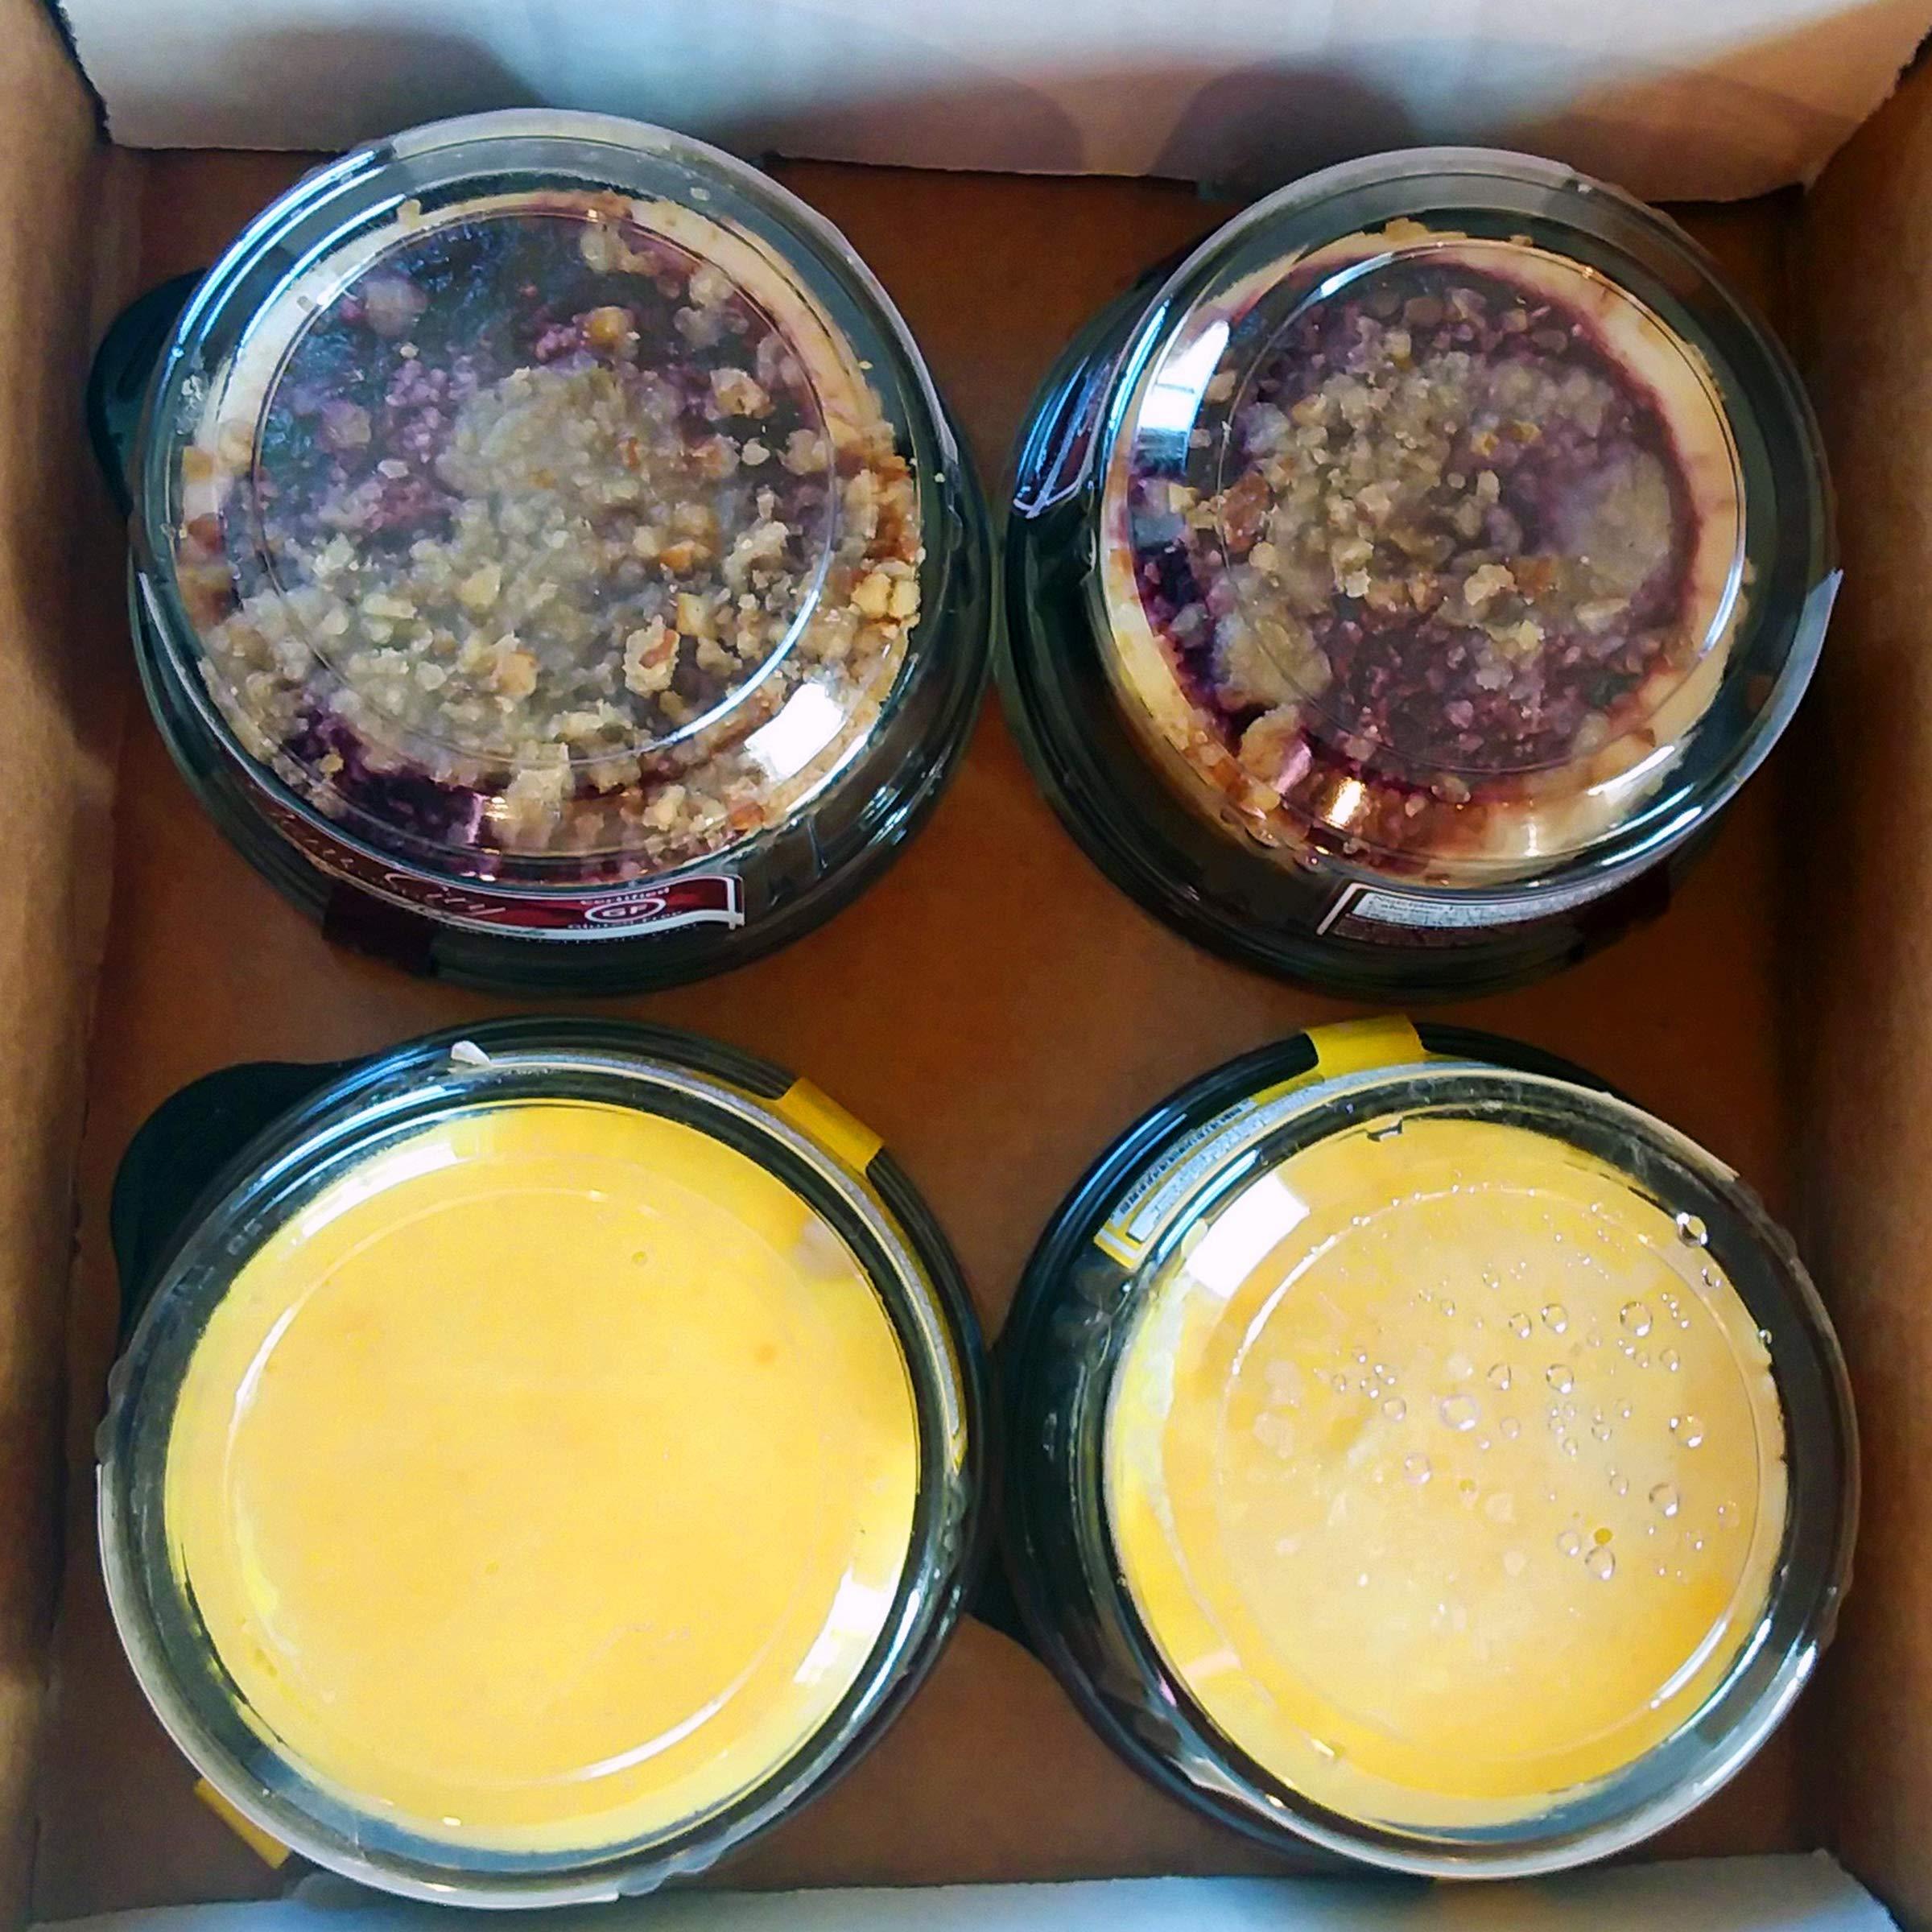 Fruit Cheesecake Sampler (Certified Gluten Free) by Gem City Fine Foods